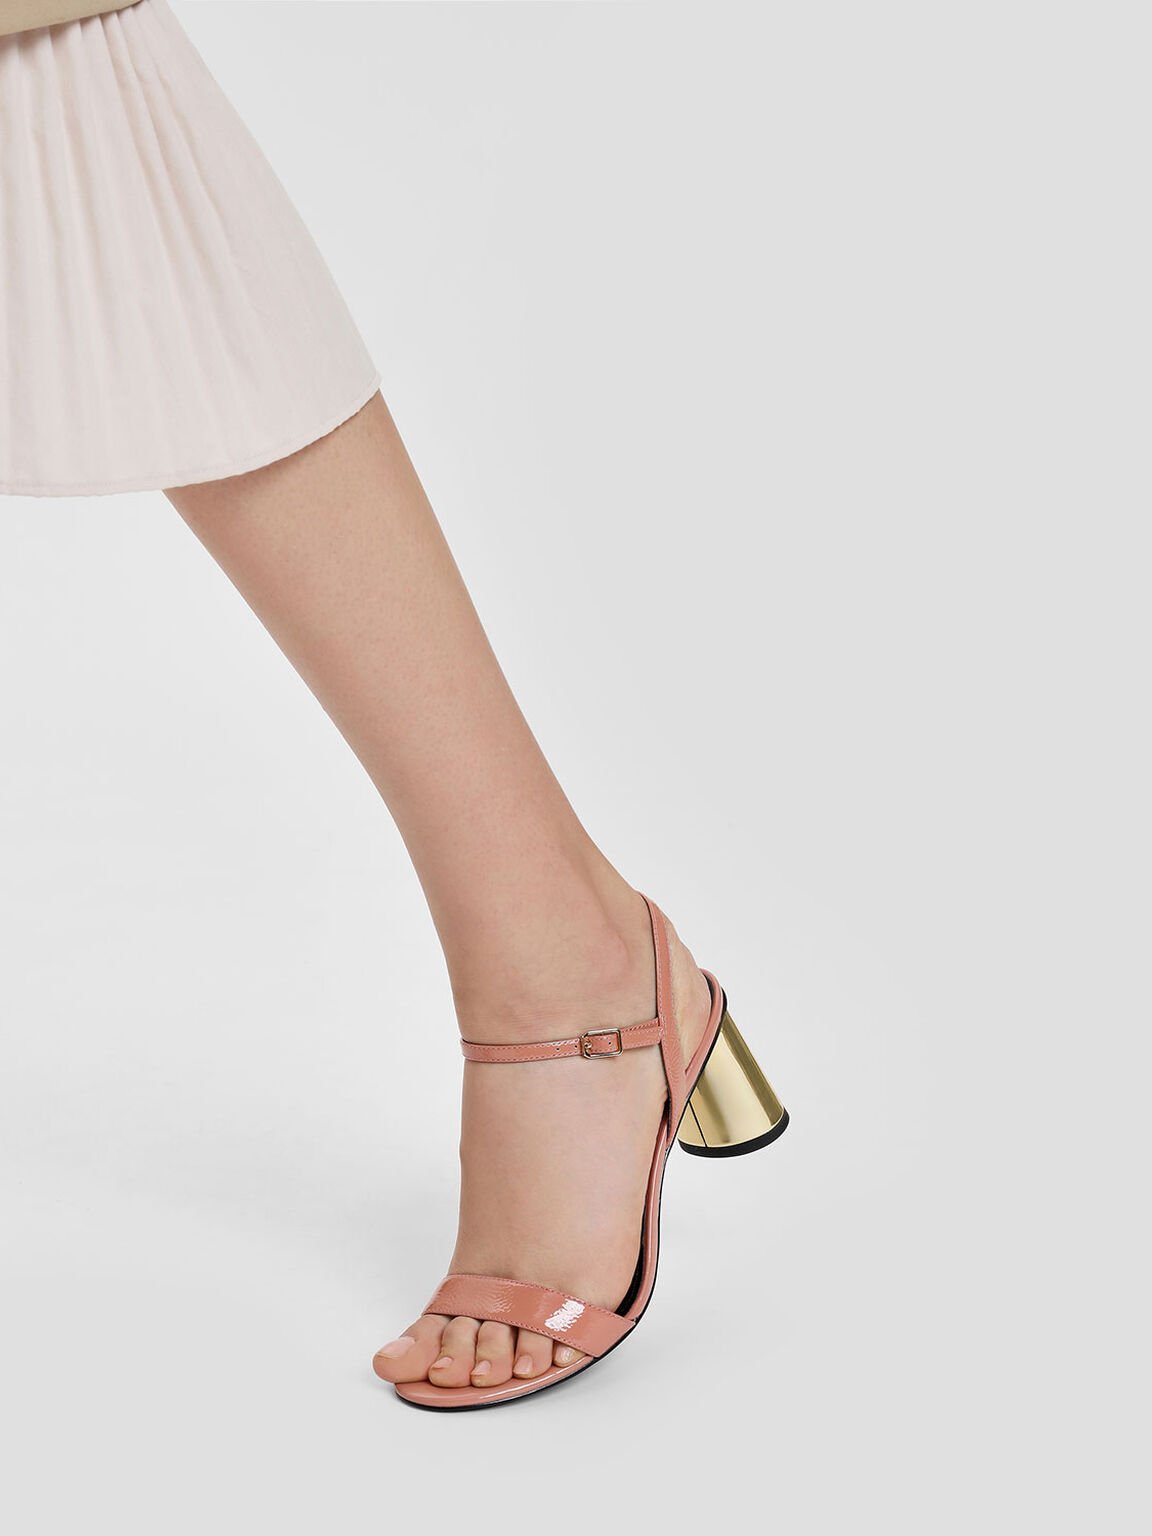 Chrome Heel Leather Sandals, Nude, hi-res